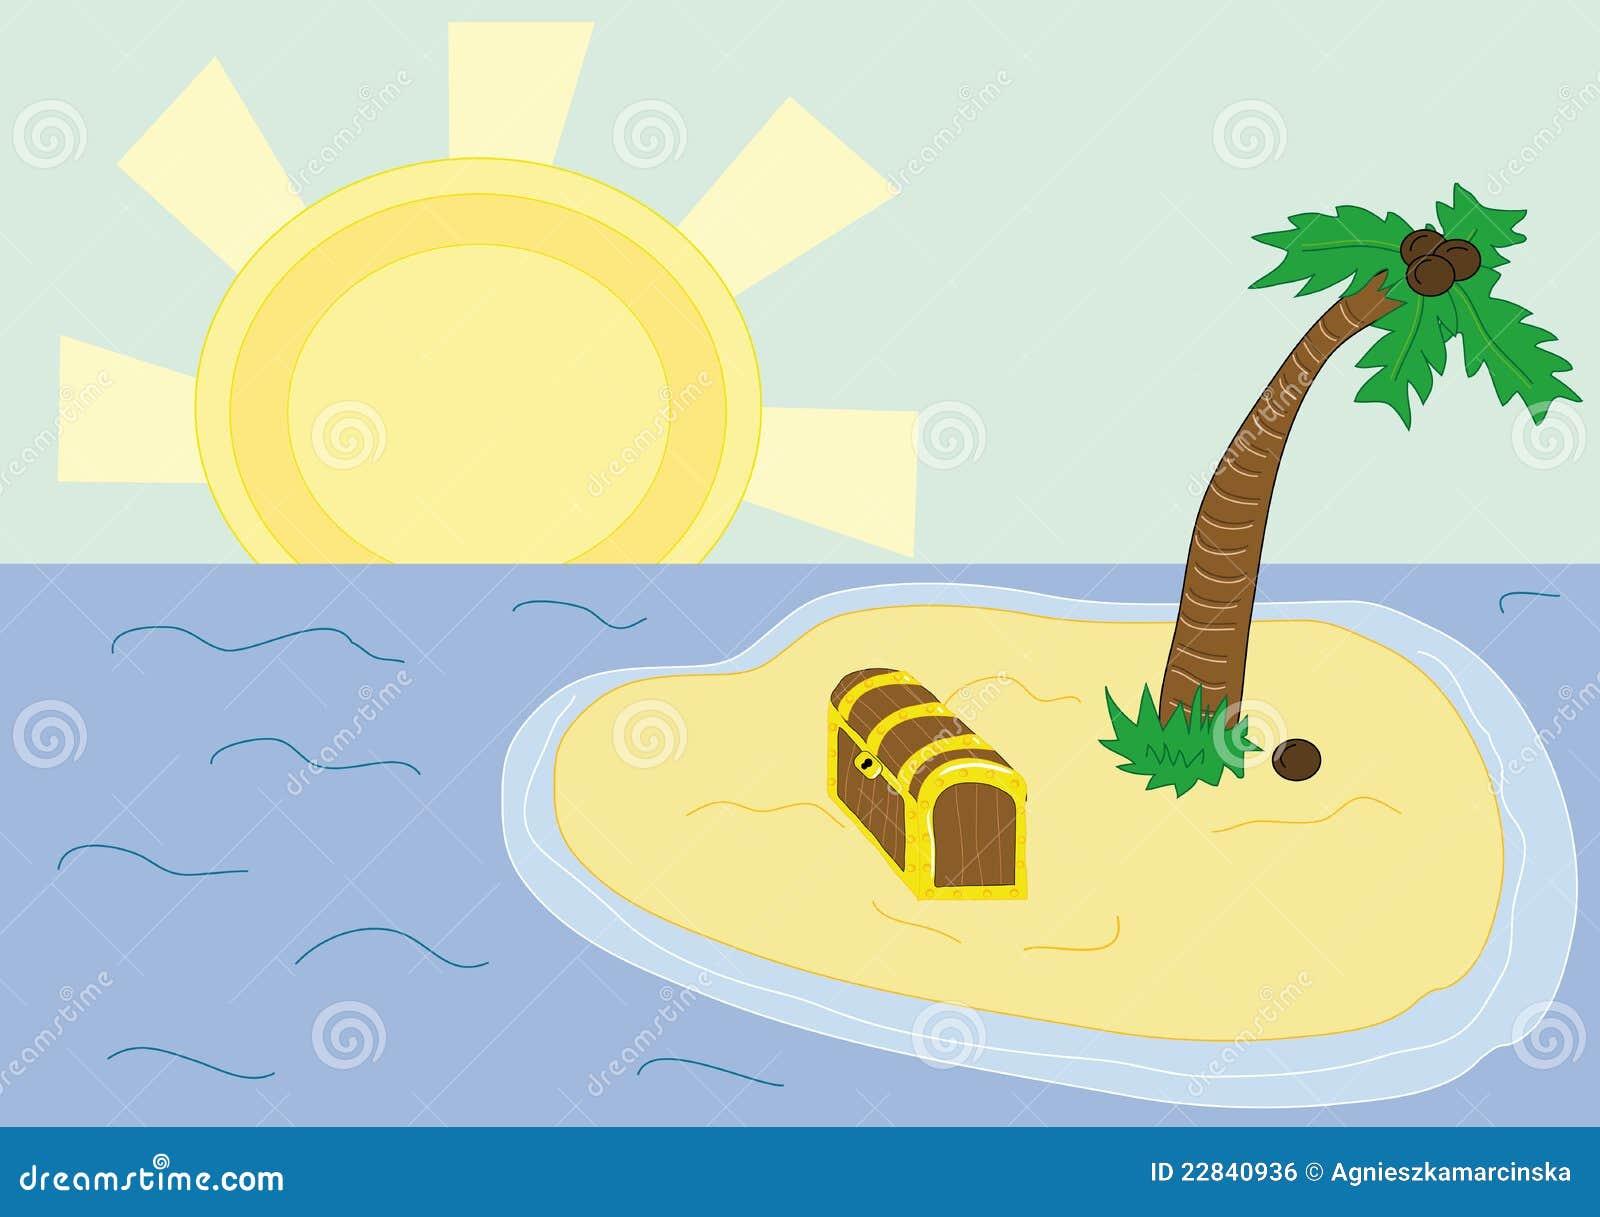 Treasure Island Royalty Free Stock Image - Image: 22840936